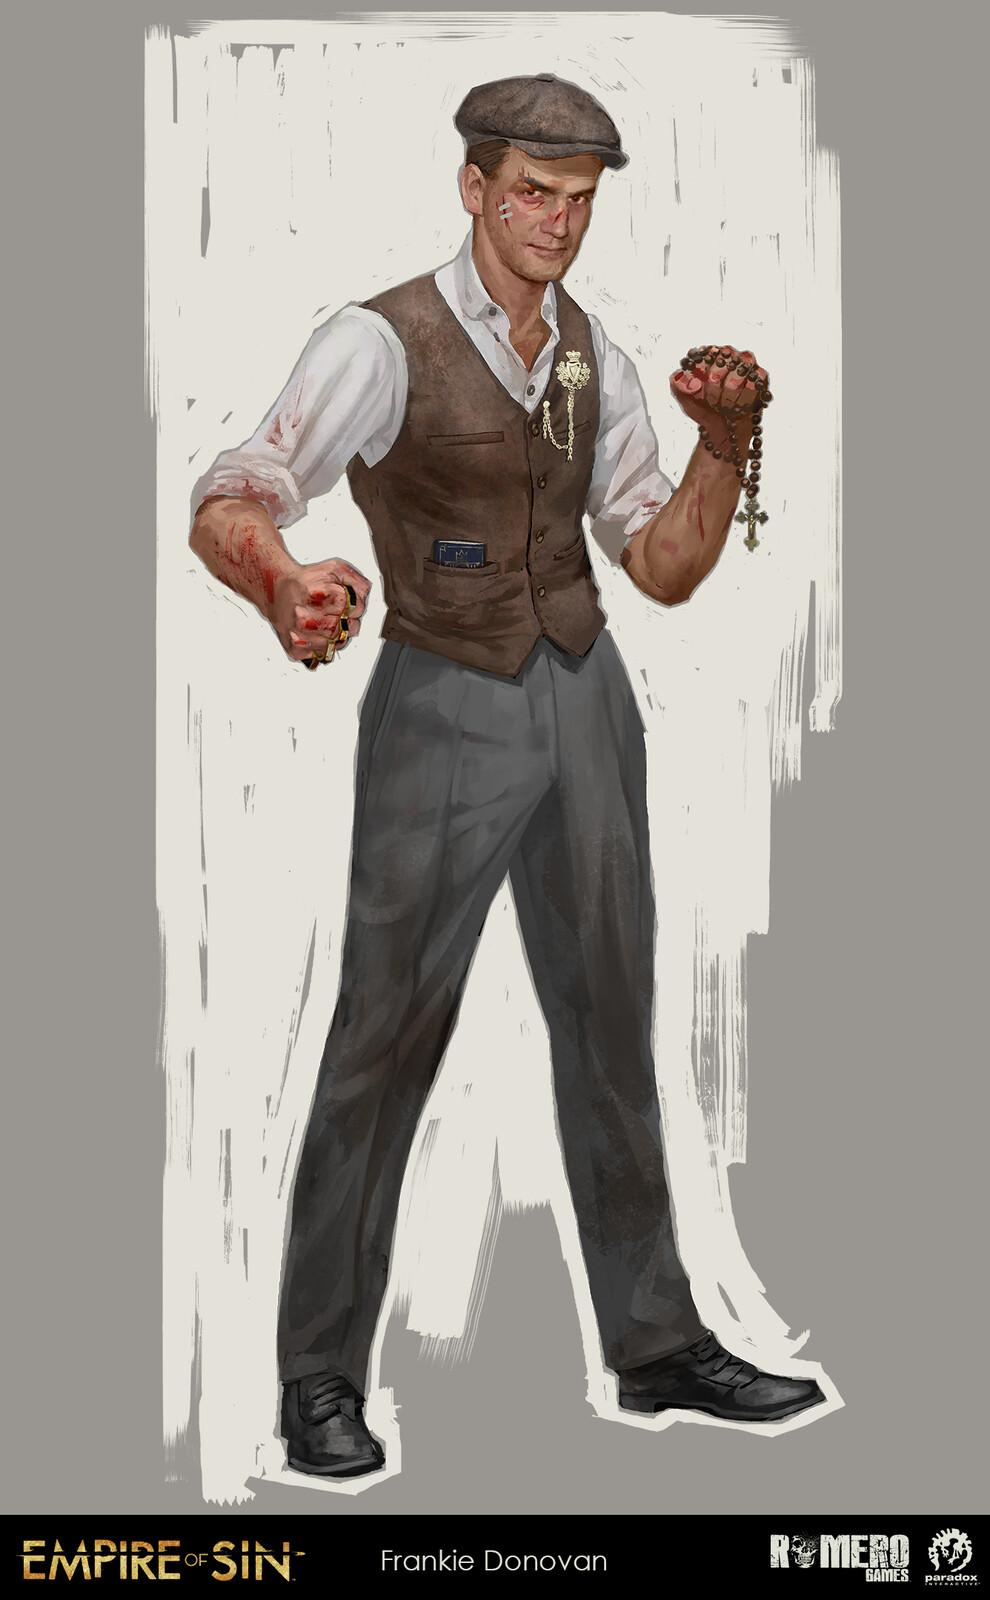 Frankie Donovan concept art. Irish boss of the Donovans gang.